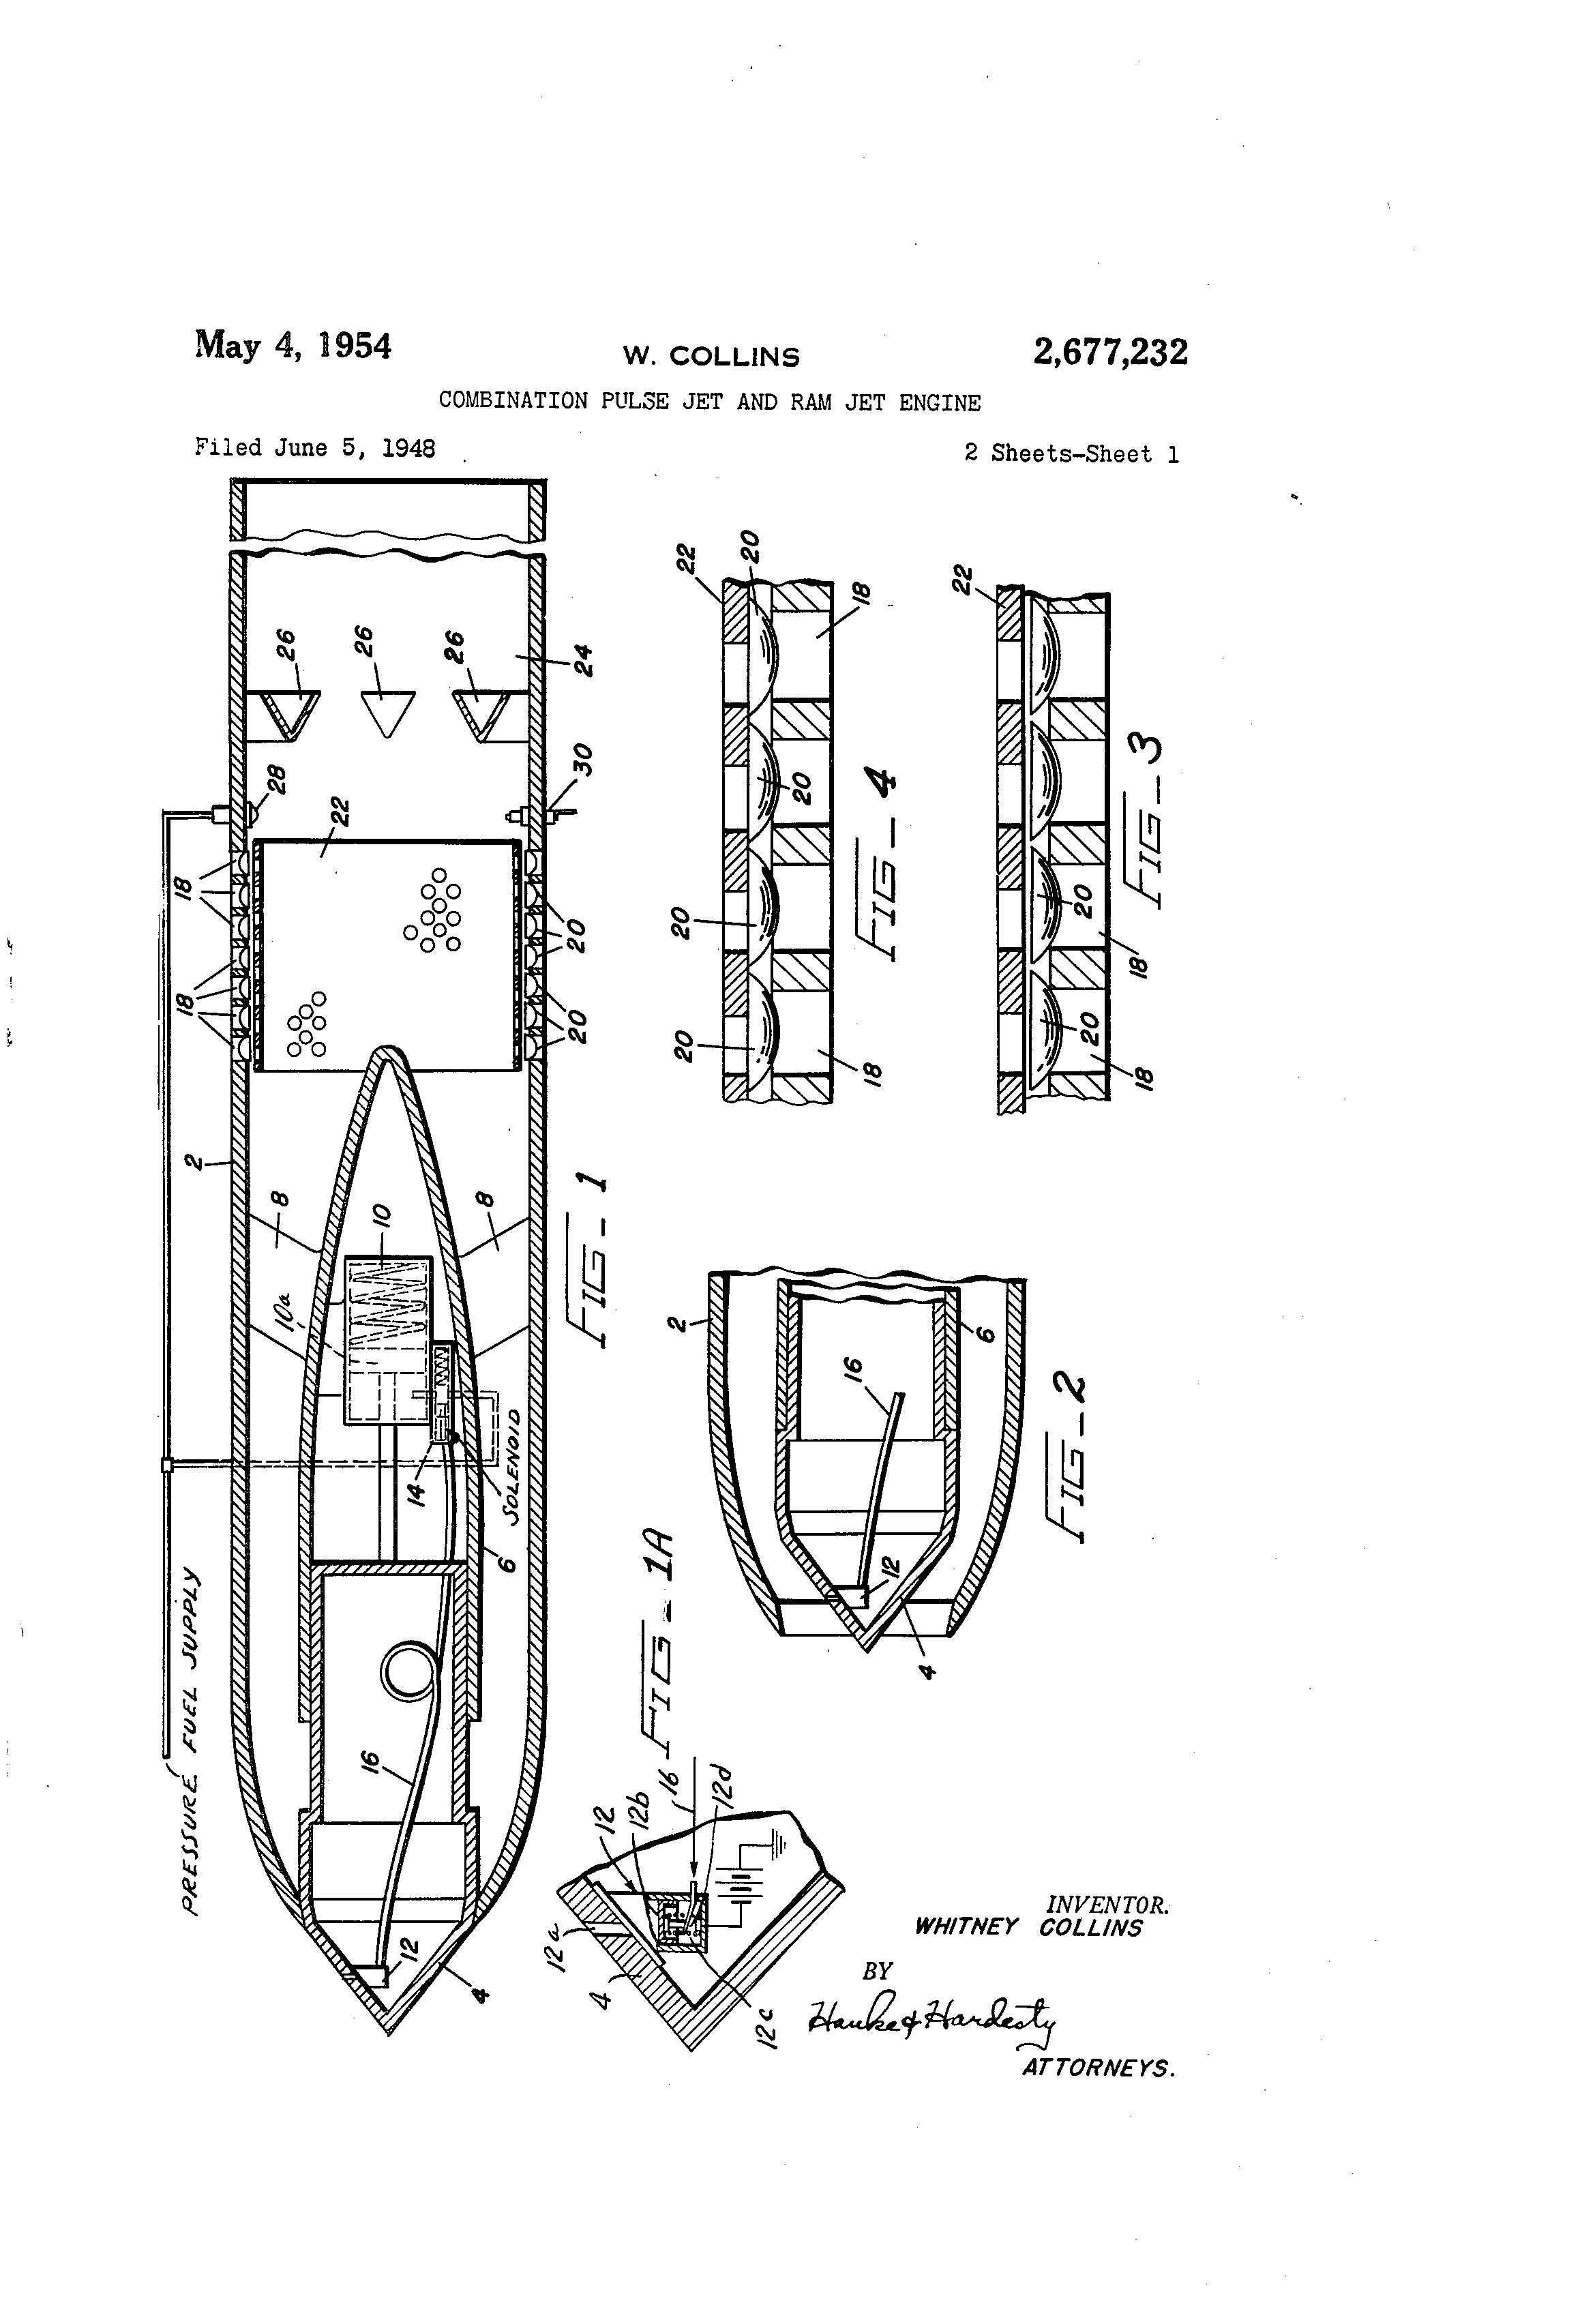 patent us2677232 - combination pulse jet and ram jet engine